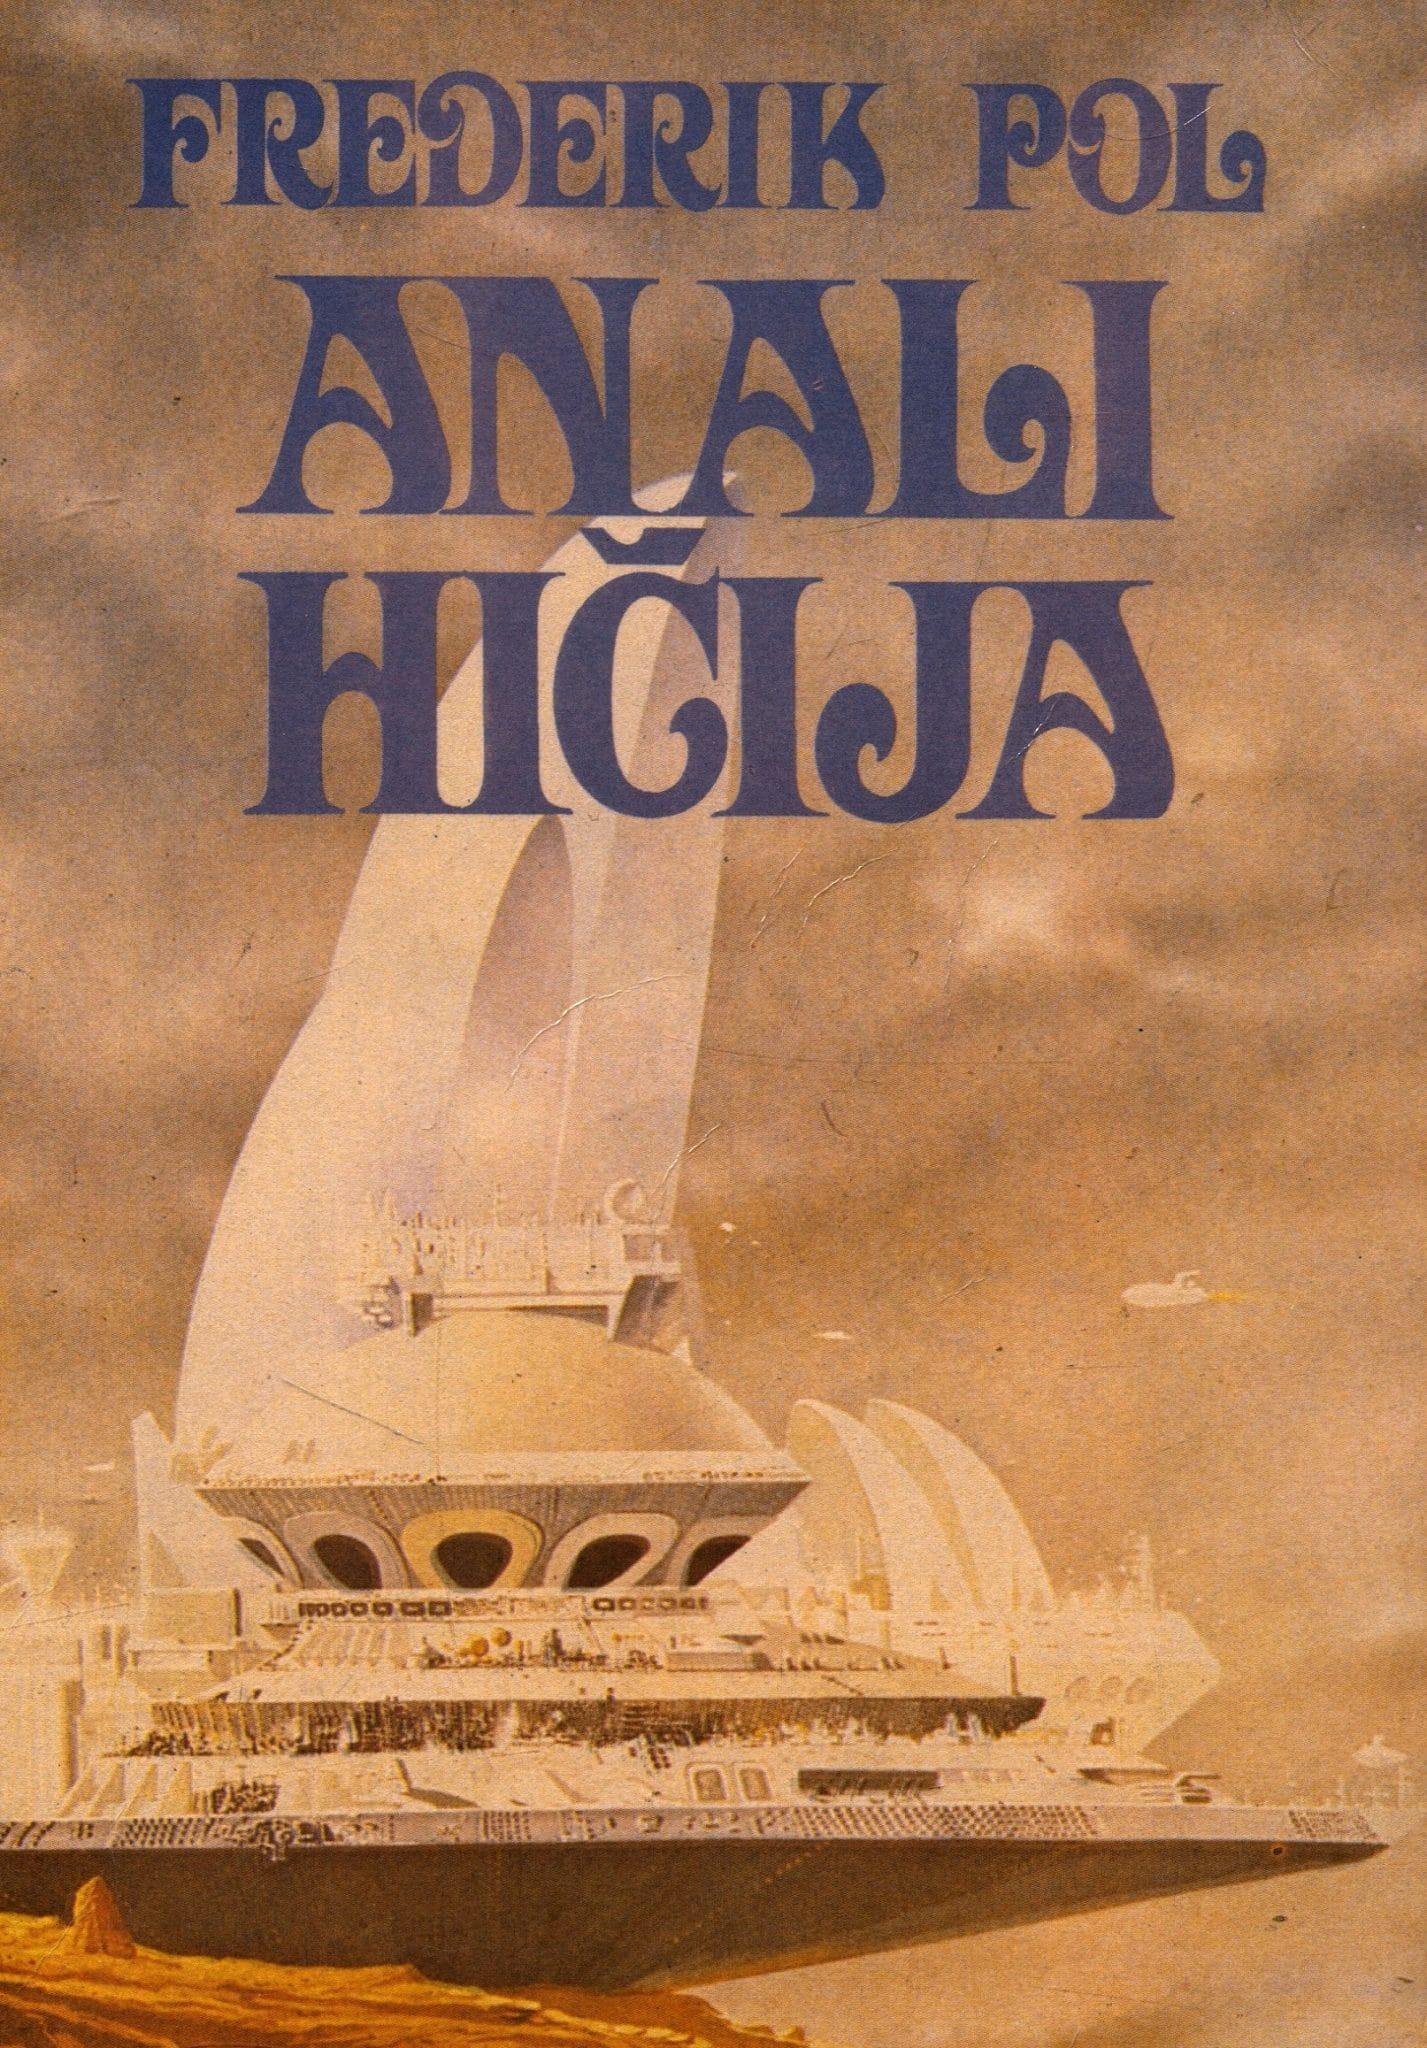 Anali Hičija Pohl, Frederik